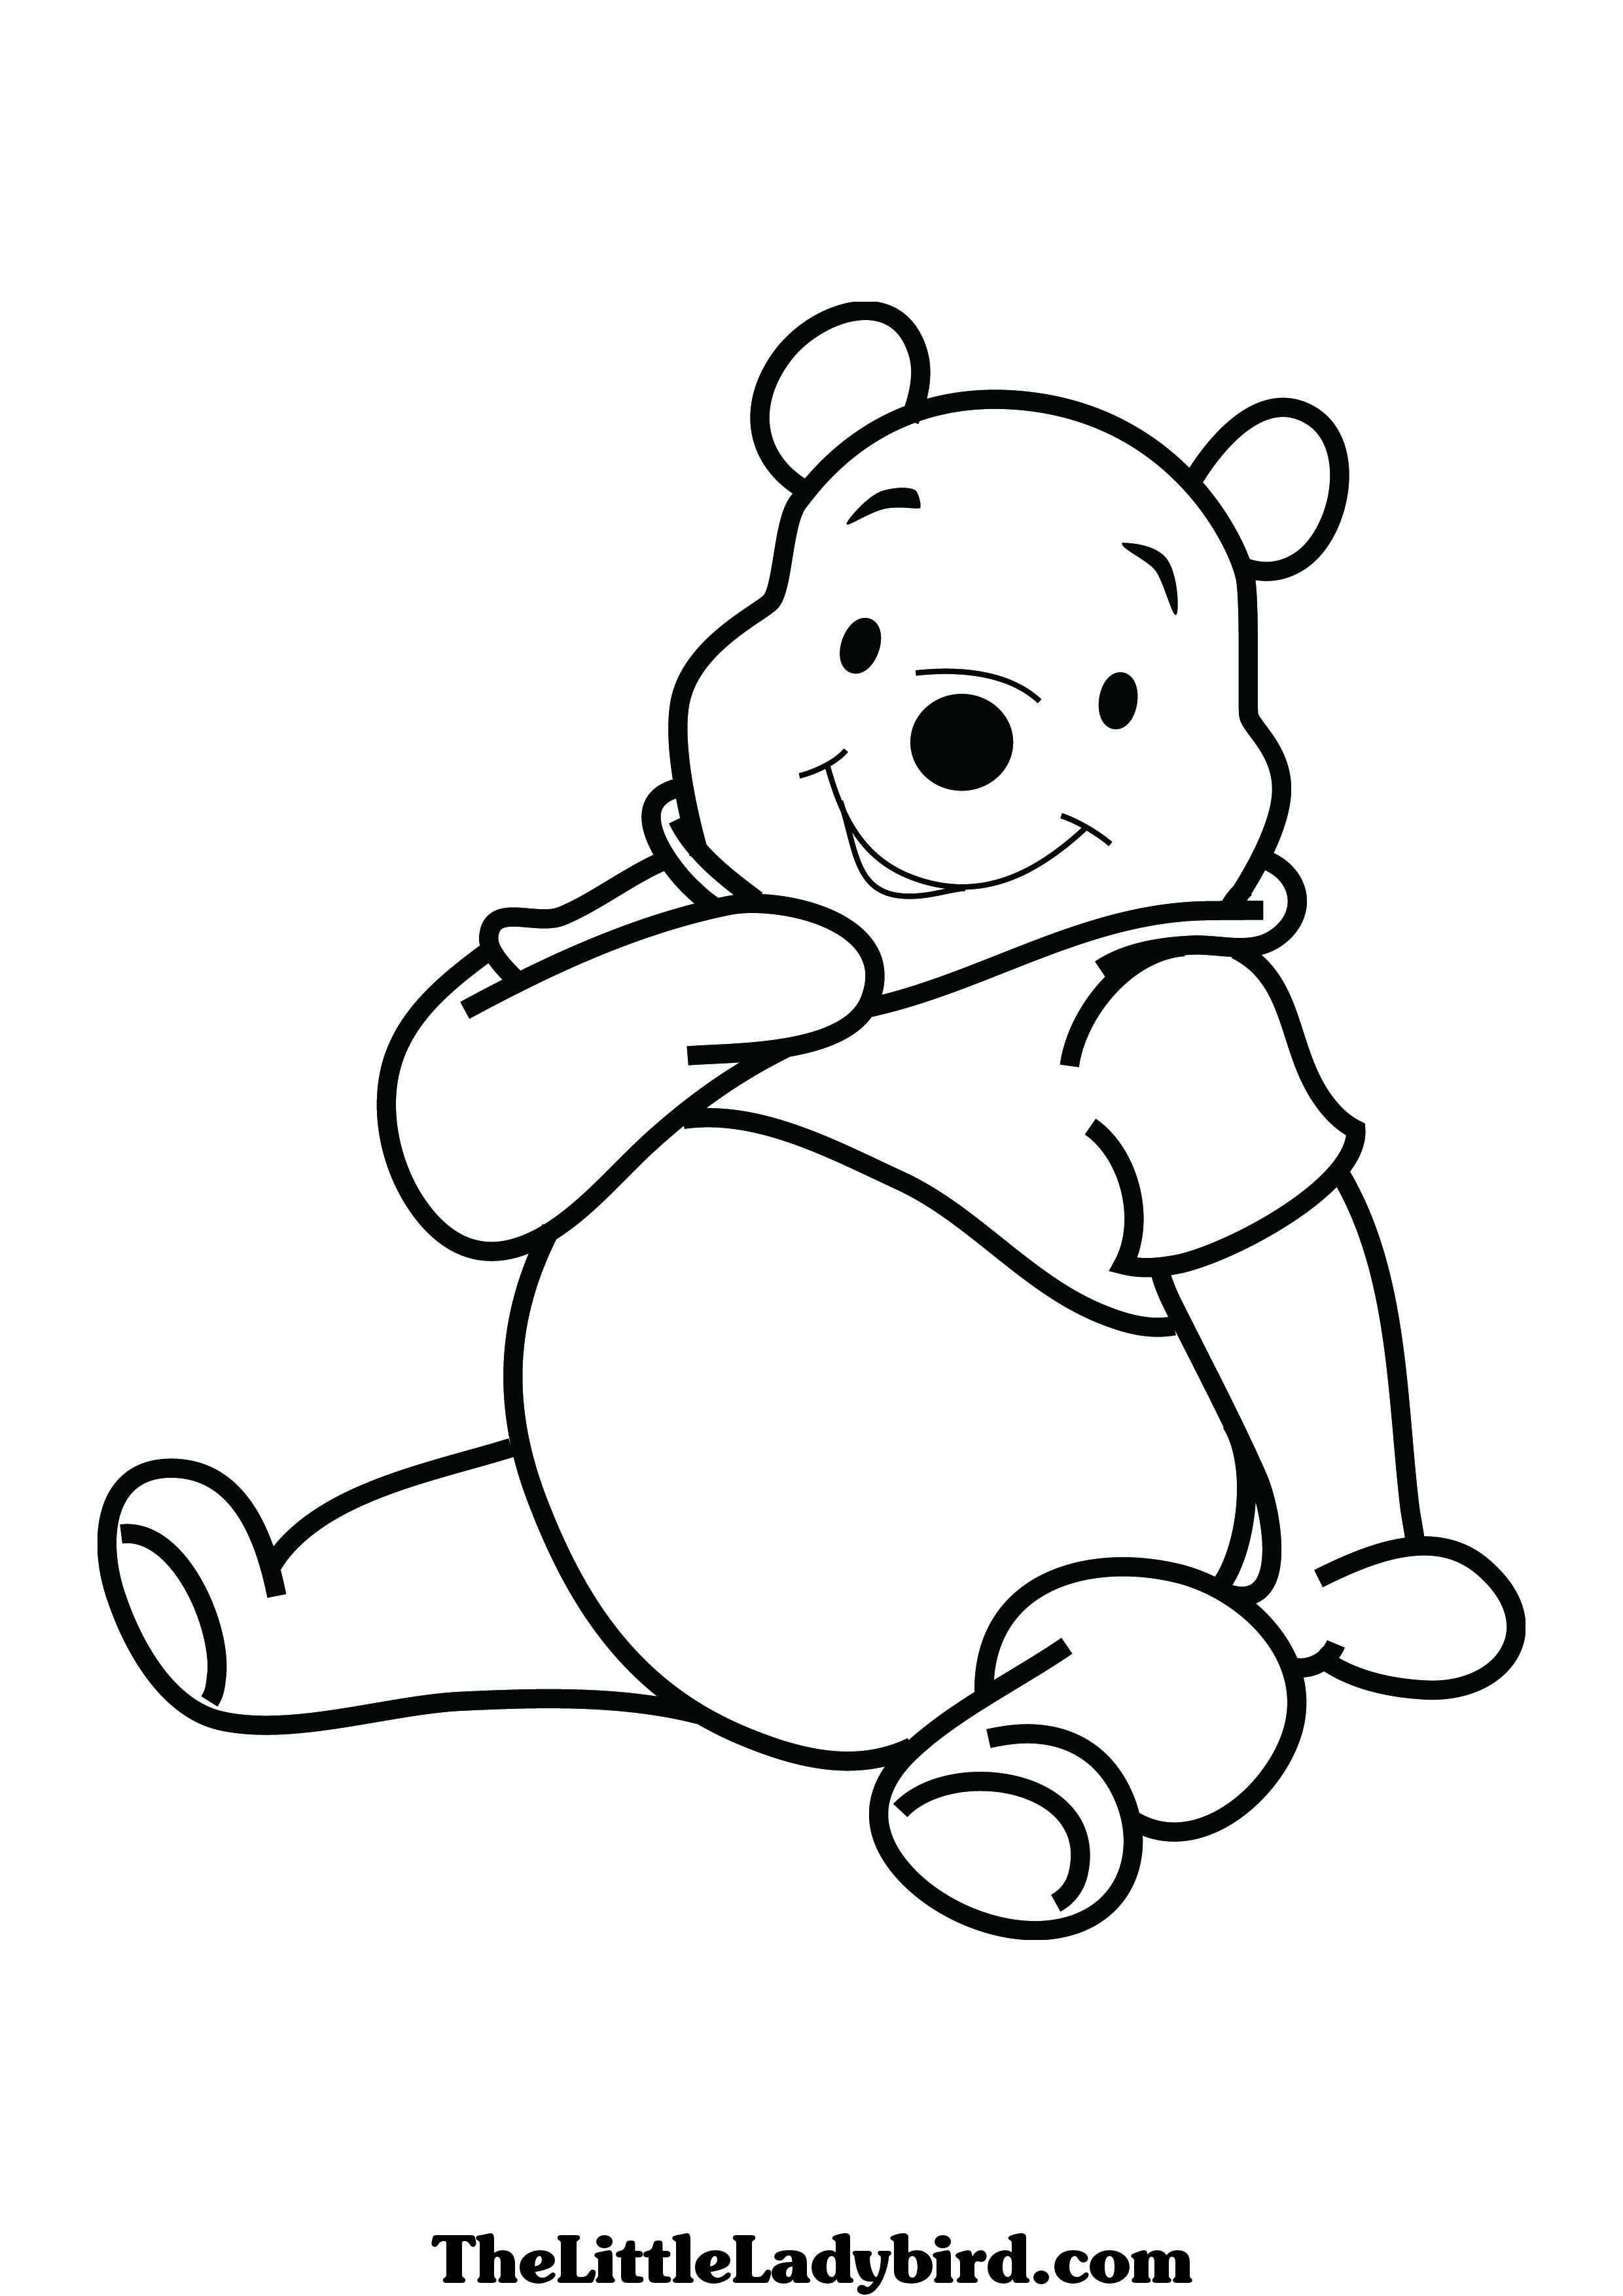 Winnie The Pooh Clipart Black And White | Free download best Winnie ...